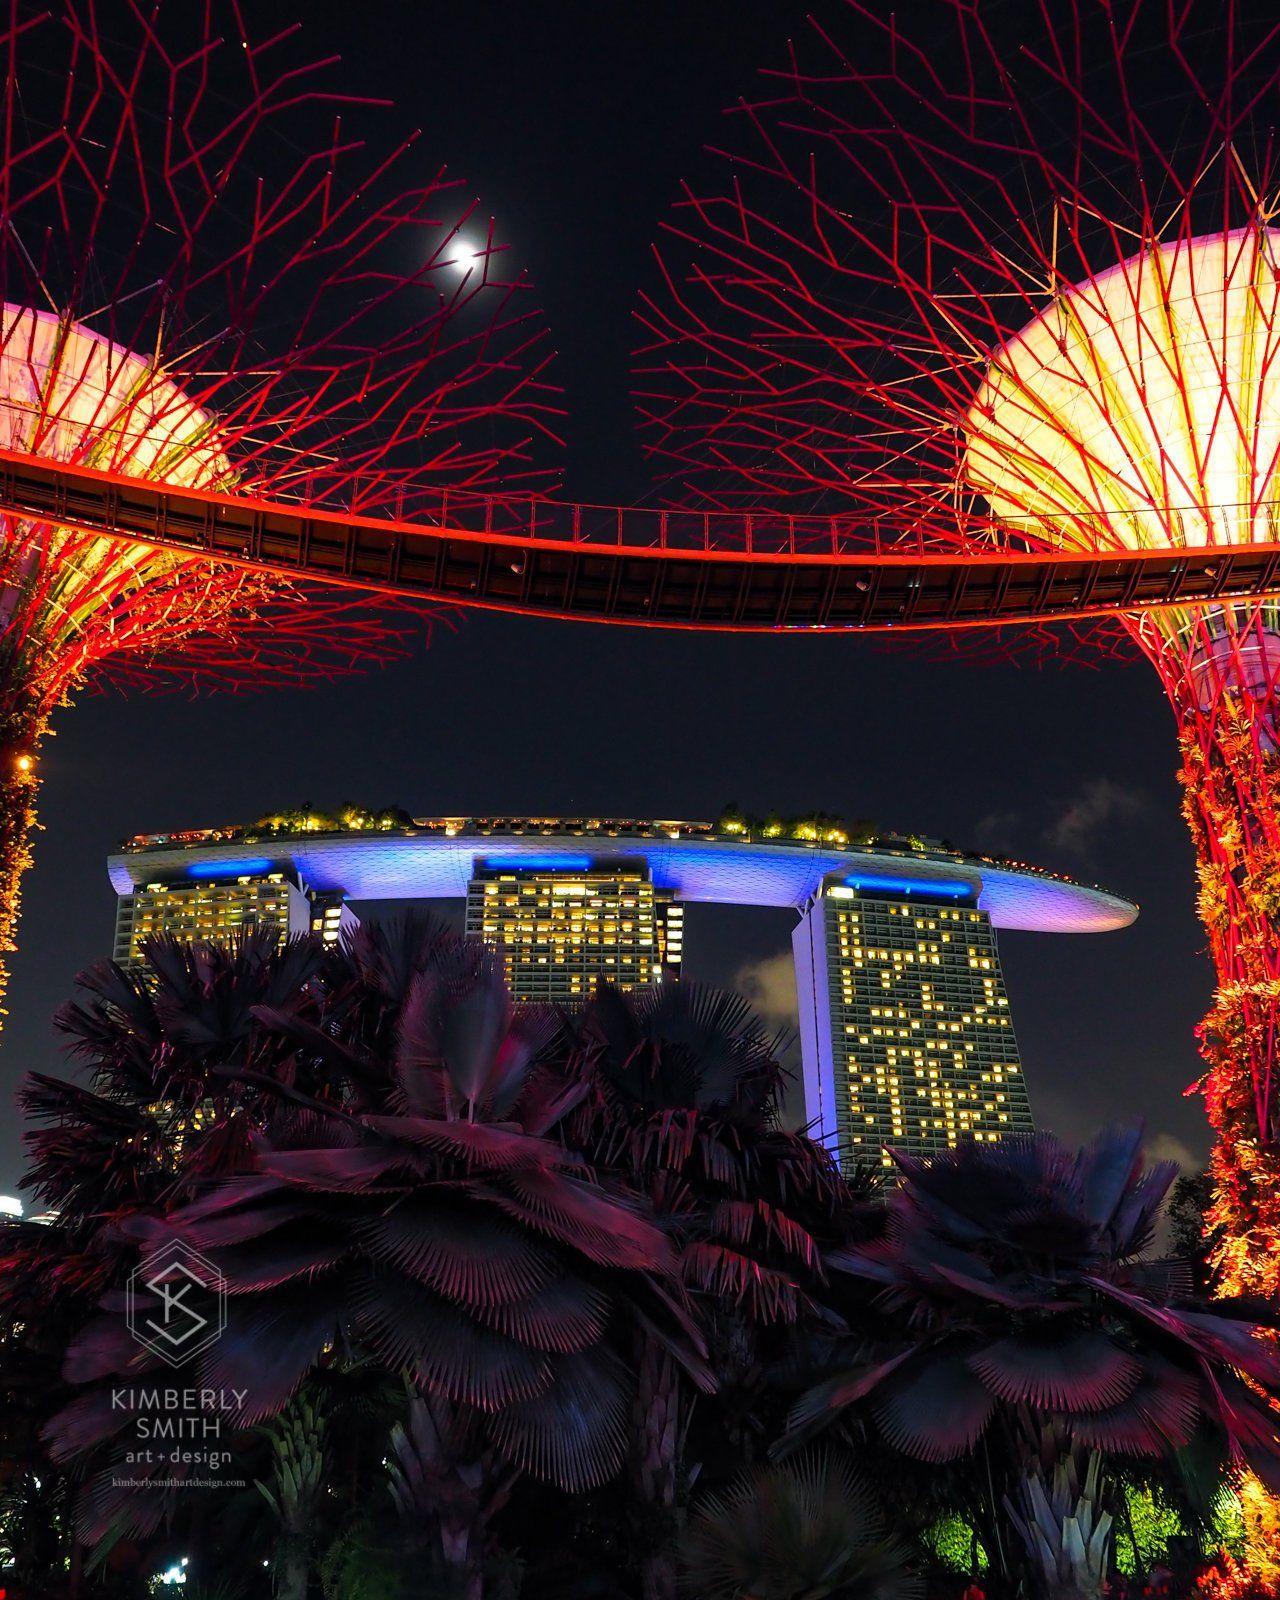 Neon Trees Singapore - Colorful Night Architecture Fine Art